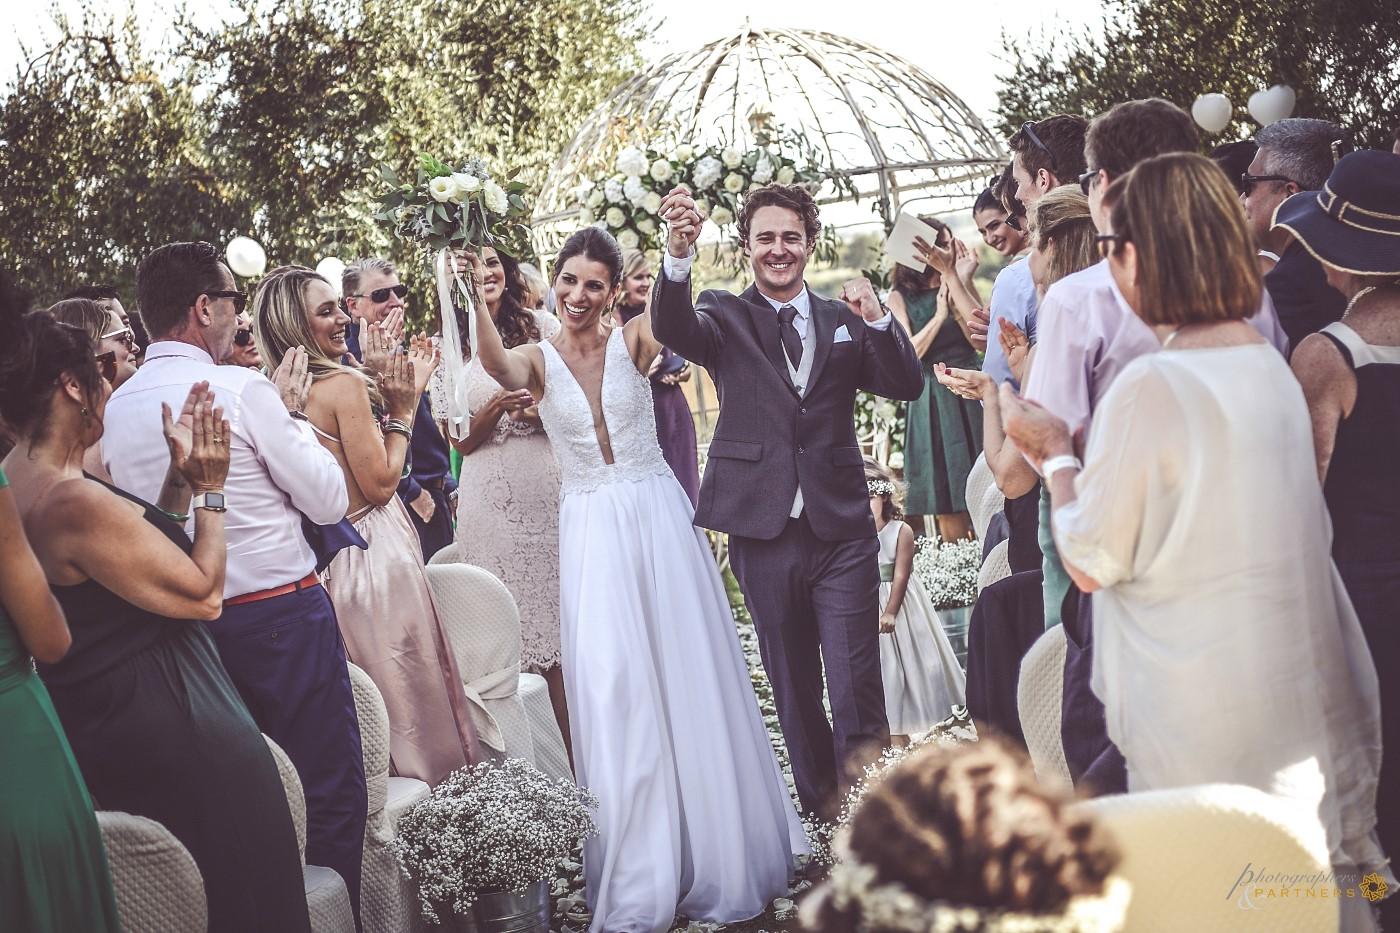 photographer_weddings_montepulciano_10.jpg